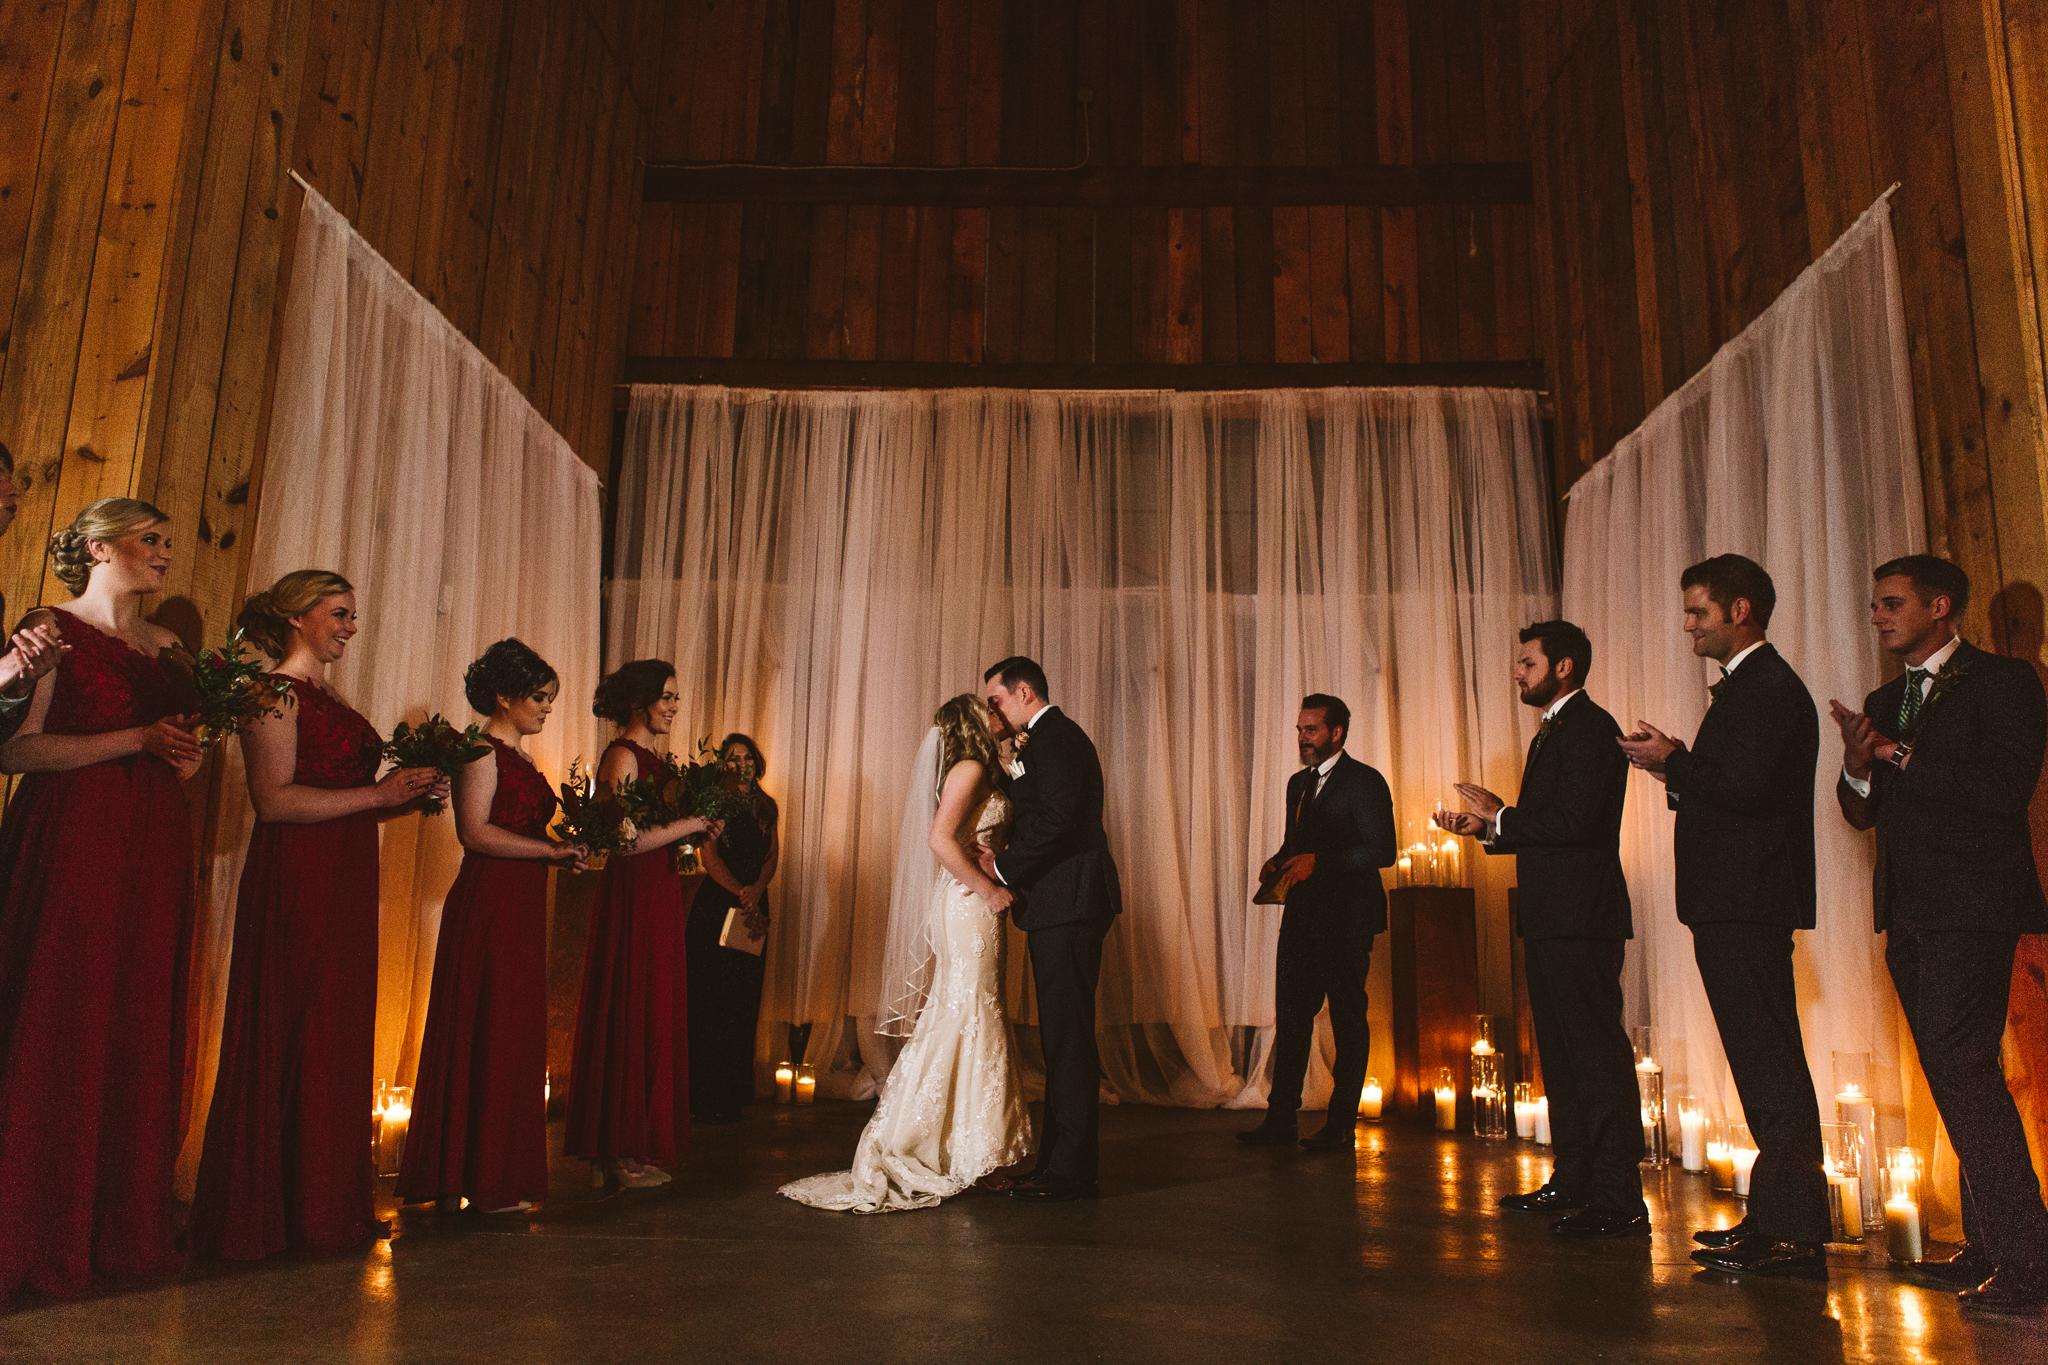 0124 Ariana Jordan Photo - Cameron & Lauren's Wedding at Talon Winery  9160.jpg